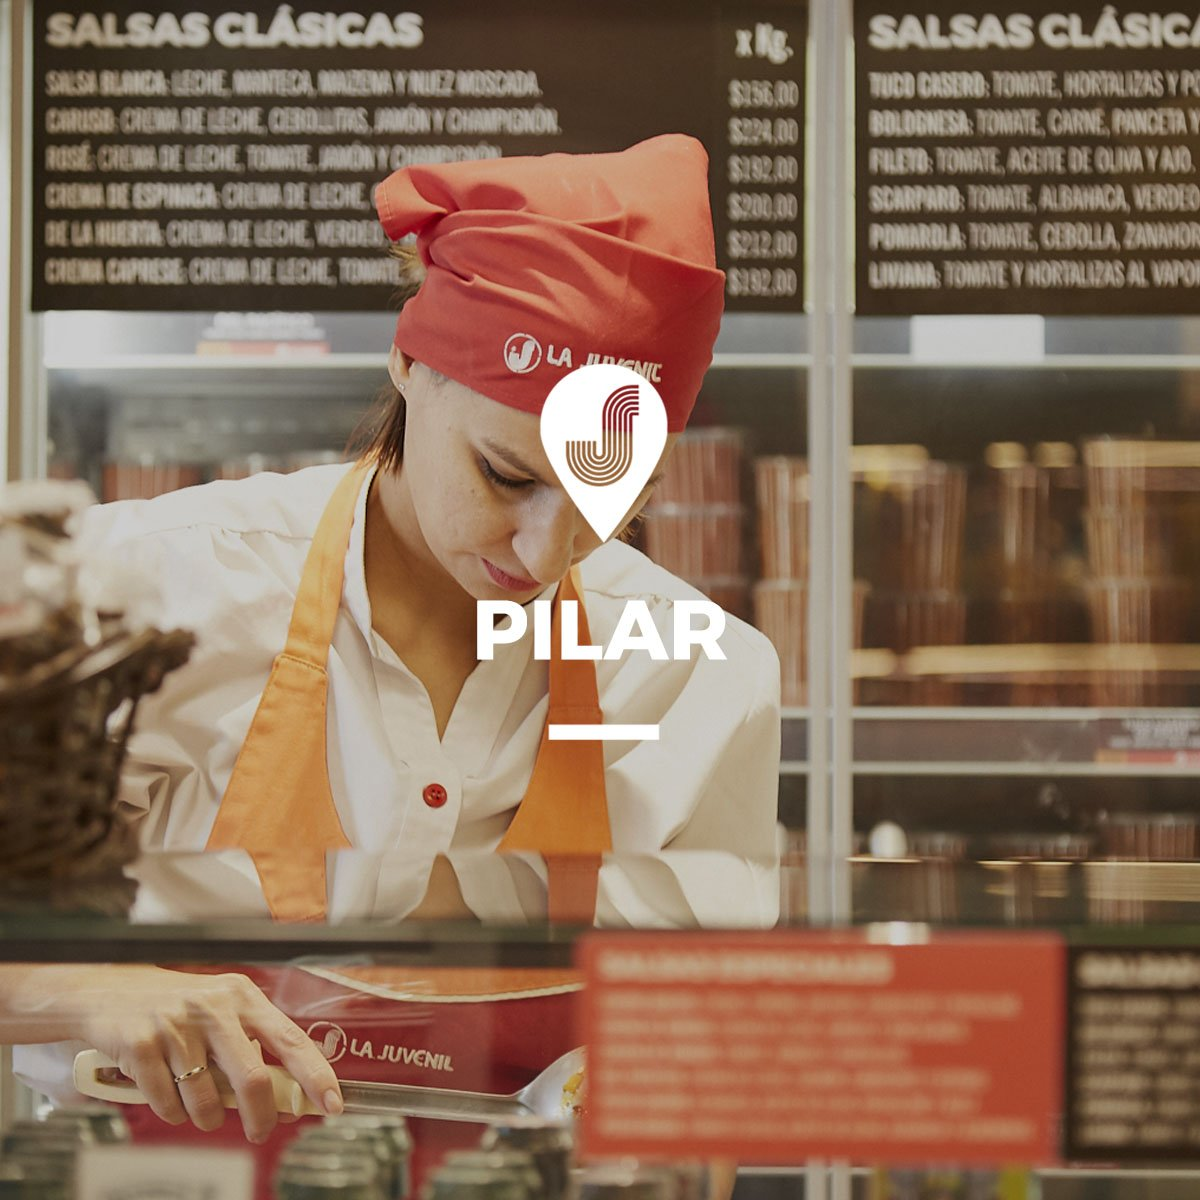 #Pilar: resolvemos tu próxima comida con las mejores pastas, nuestra #MarcaRegistrada @paseopilar Panamericana Ramal Pilar Km44 02320-657757  Lunes a domingo+feriados 10-21hs  Crédito (Amex-Cabal- Master-Visa), débito Parking sin cargo  Pastas calientes a toda hora pic.twitter.com/fguv8WfHZC